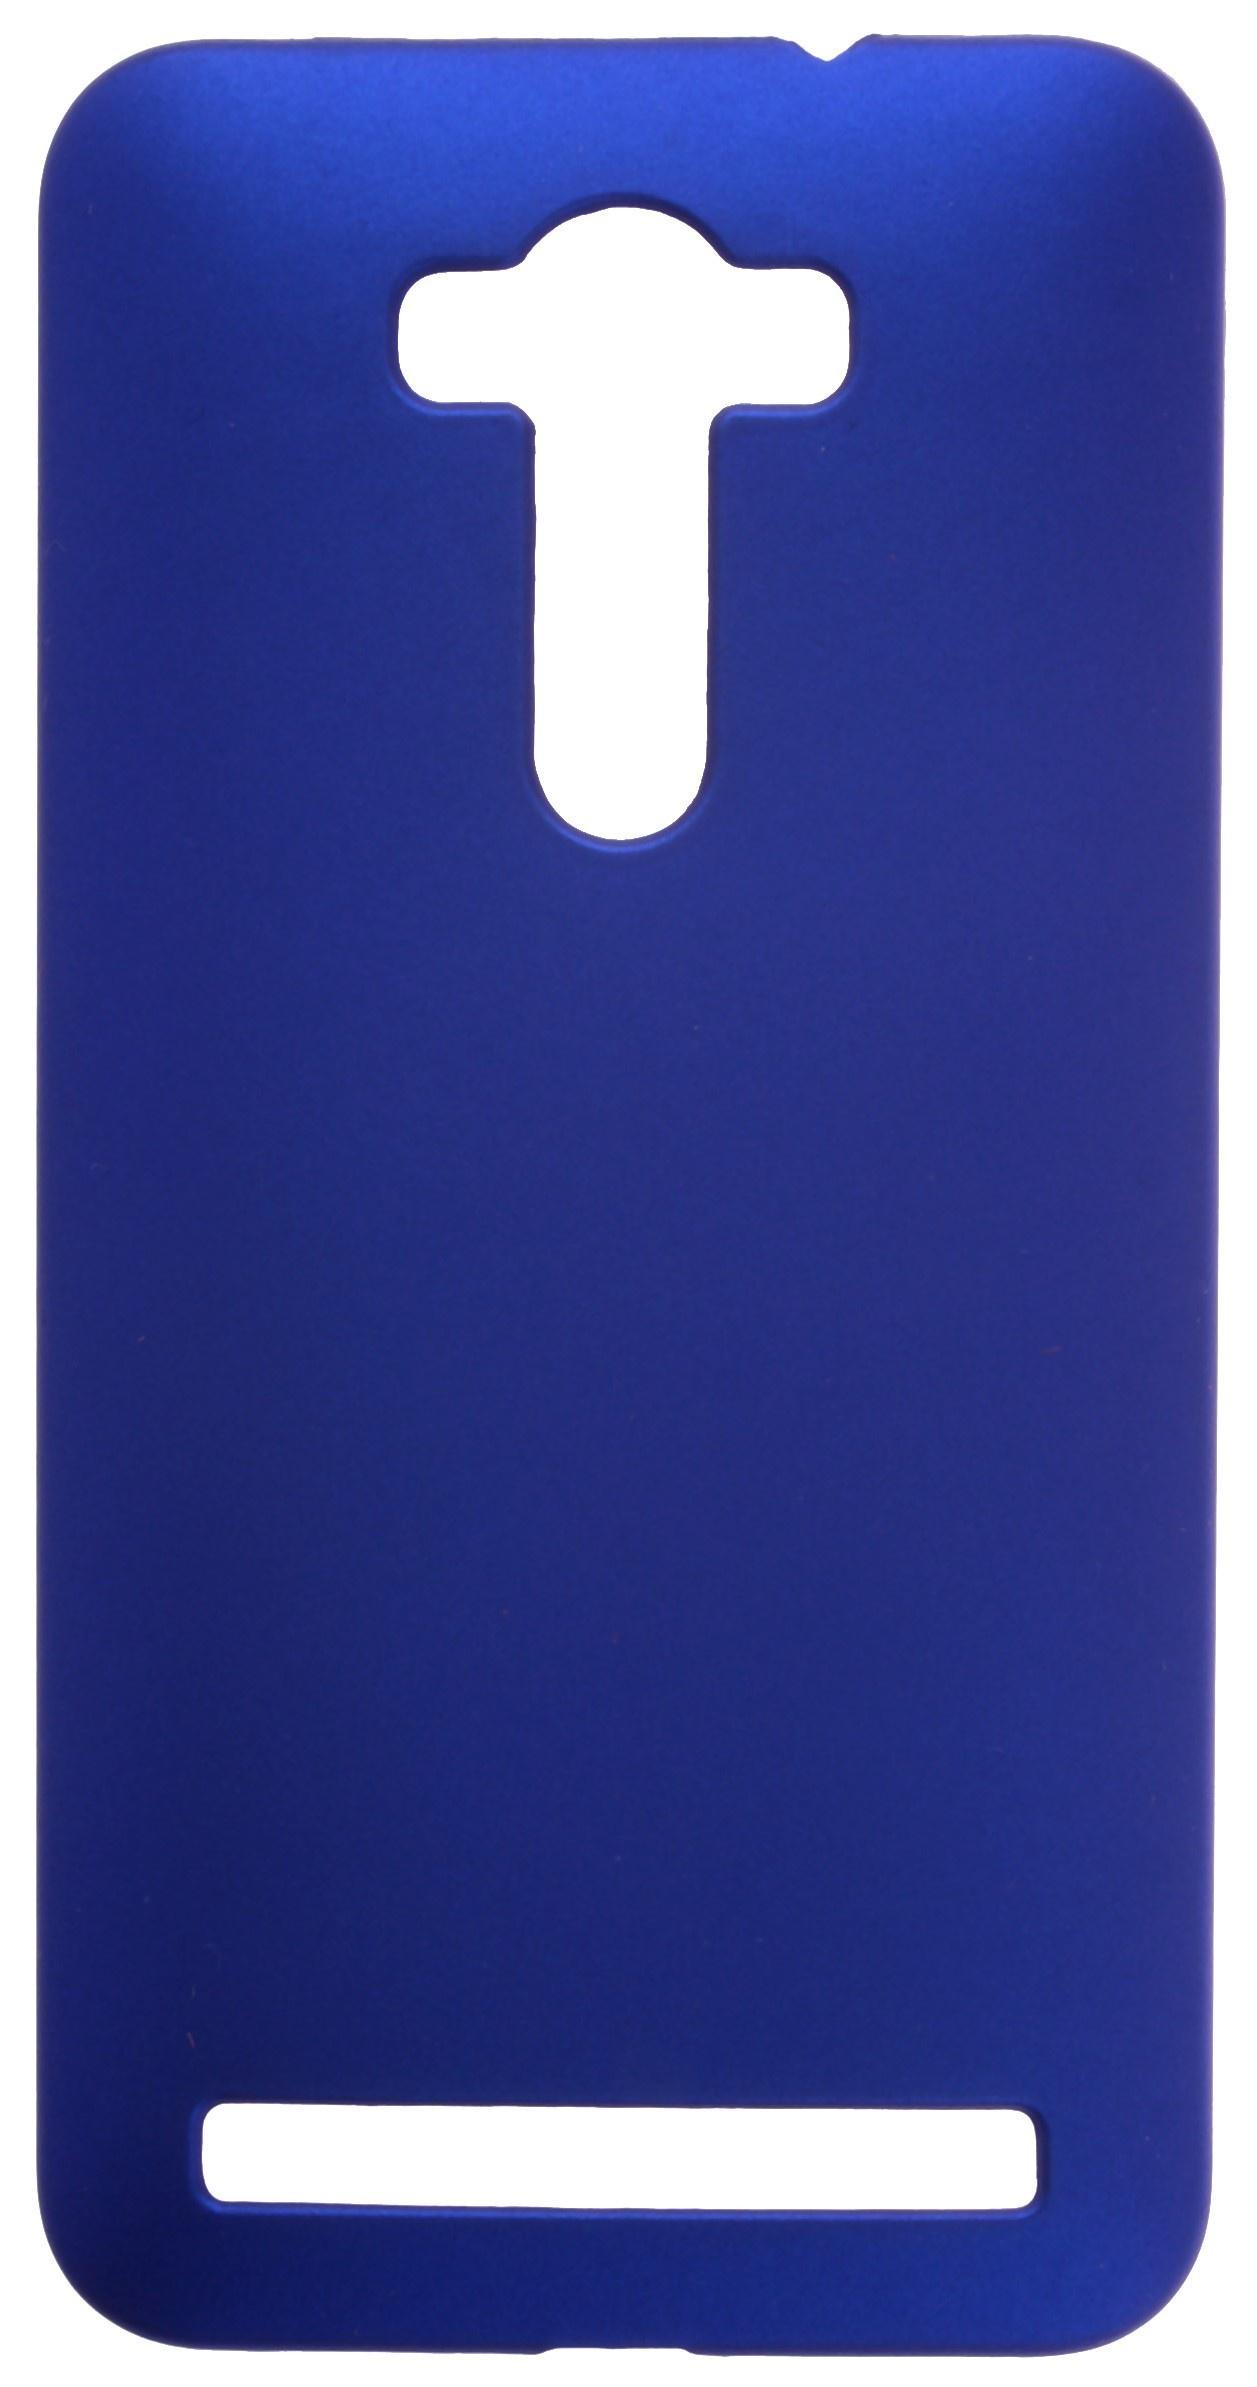 купить Чехол для сотового телефона skinBOX 4People, 4630042525009, синий онлайн